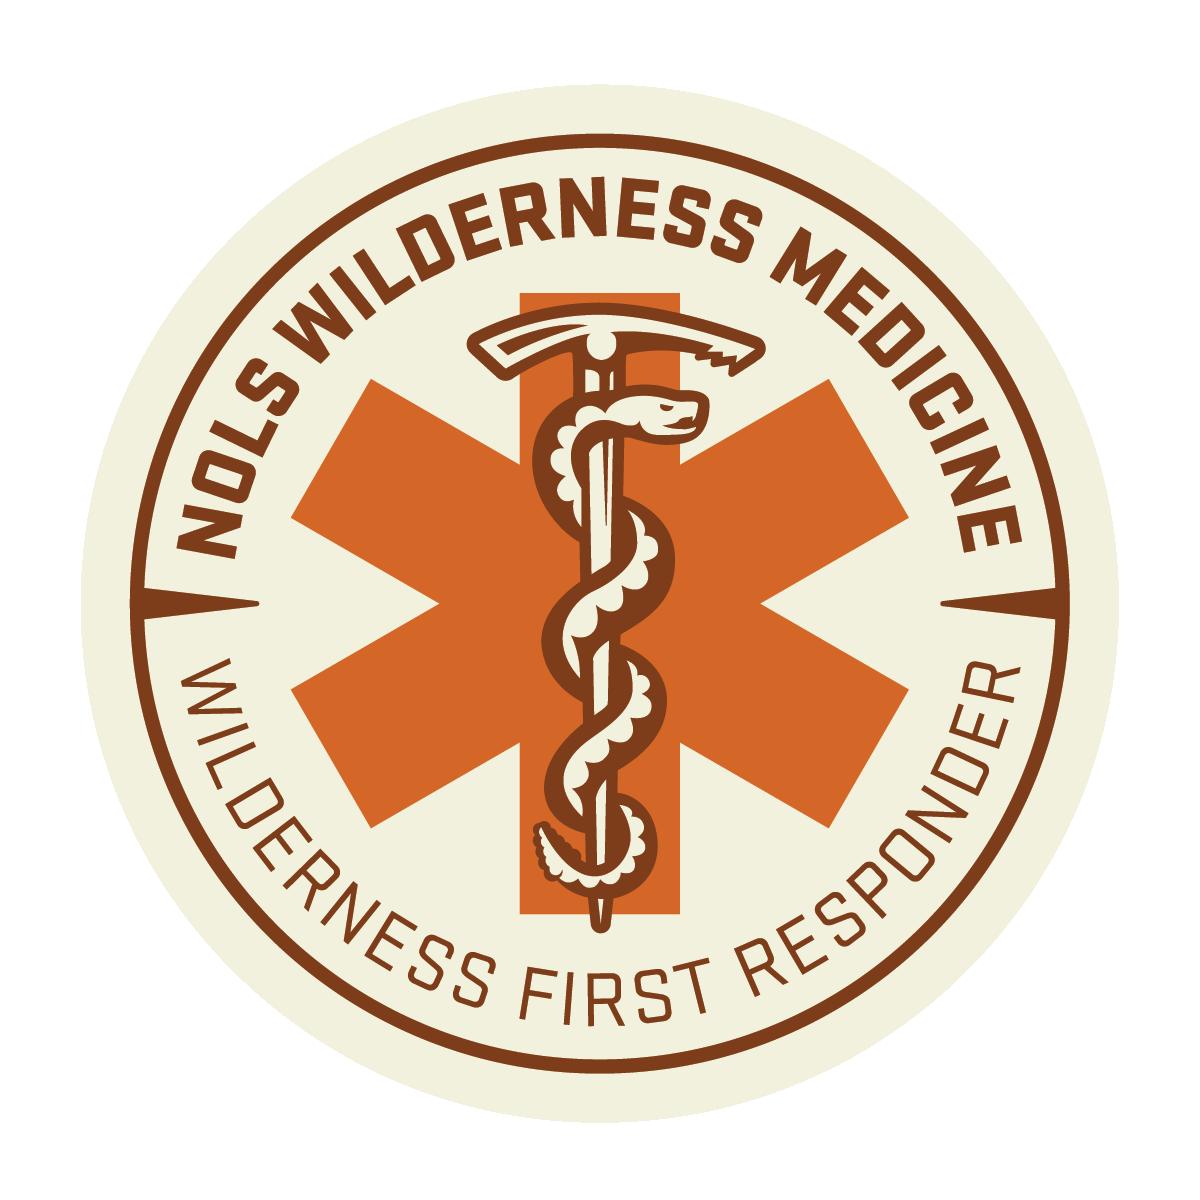 NOLS_WM_BADGE_CREDENTIAL-WILDERNESS FIRST RESPONDER.png